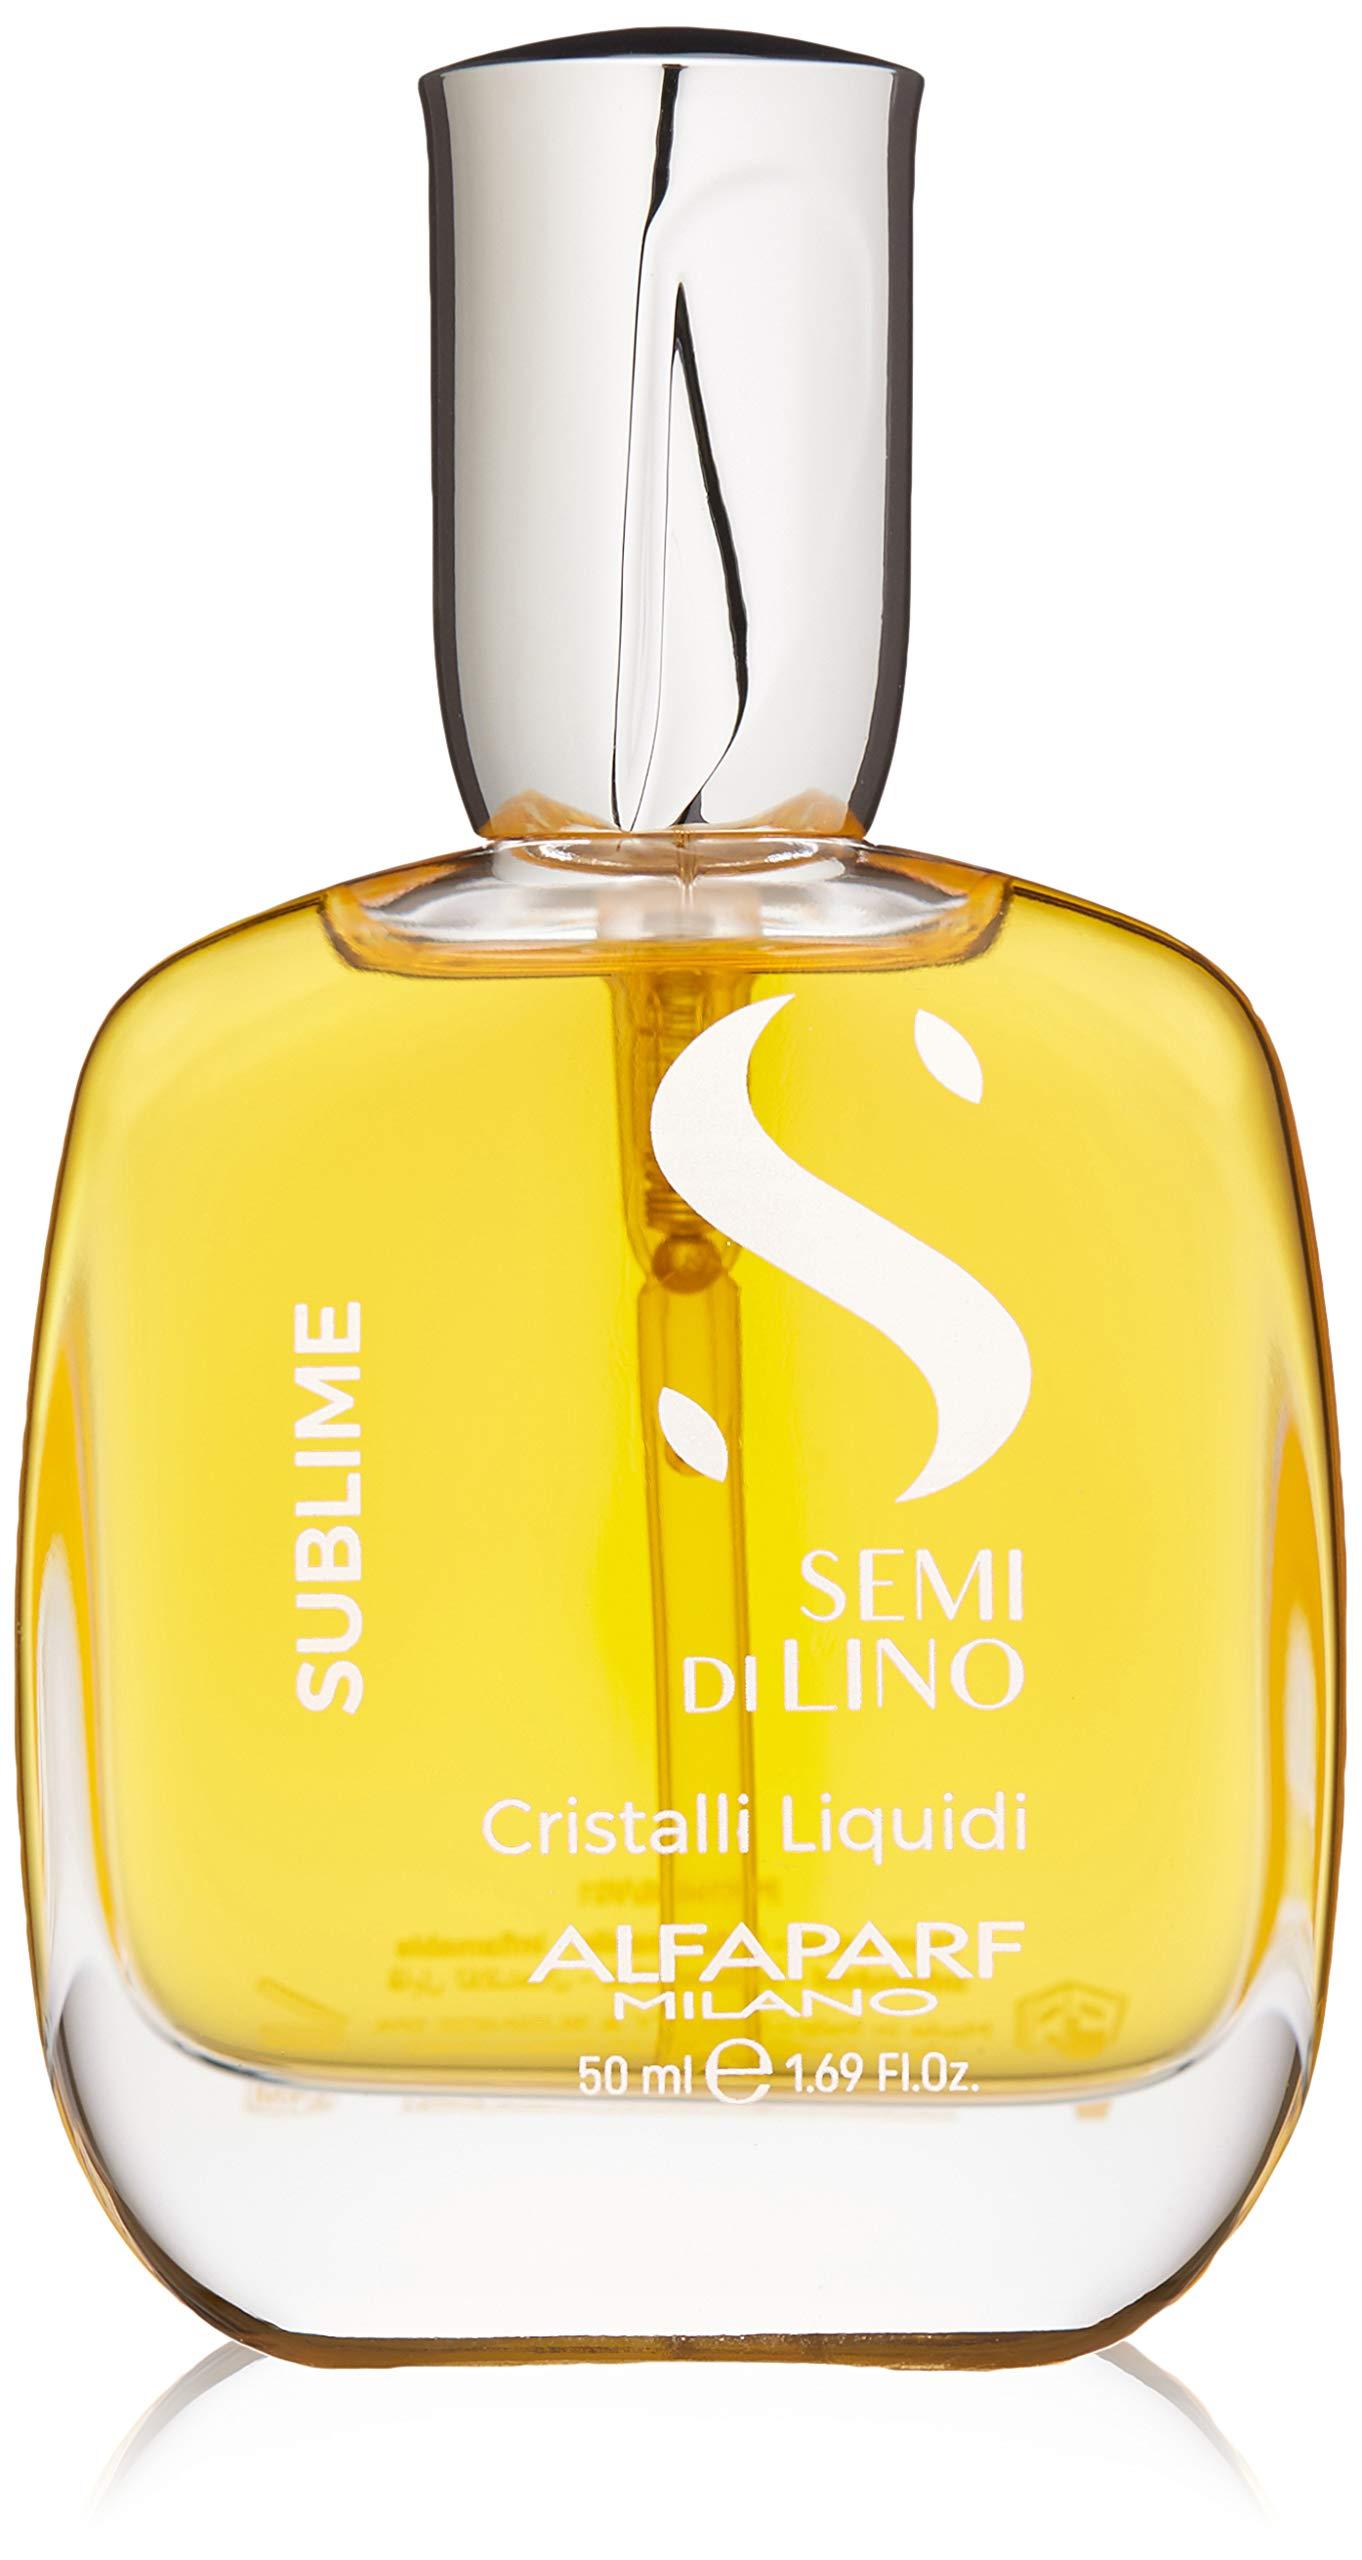 Alfaparf Milano Semi Di Lino Sublime Cristalli Liquidi Finishing Smoothing Serum - Provides Shine and Protection - Professional Salon Quality